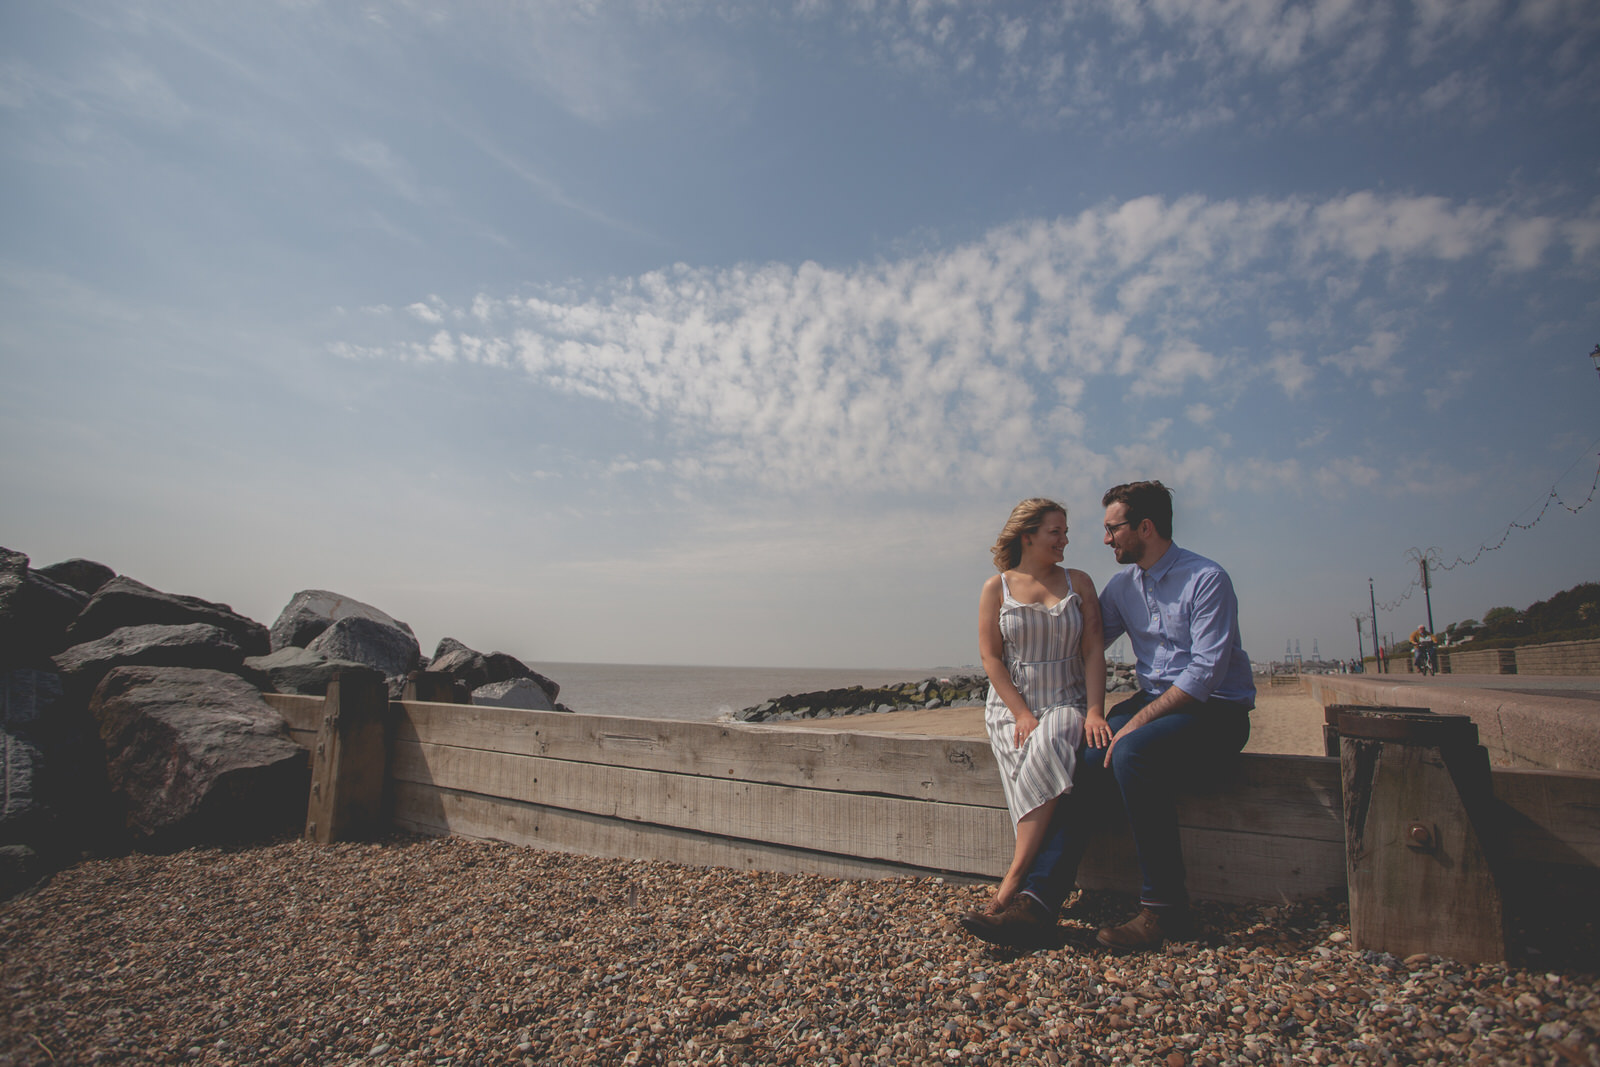 Felixstowe Beachfront Engagement - Sinead  Ryan - 003.jpg